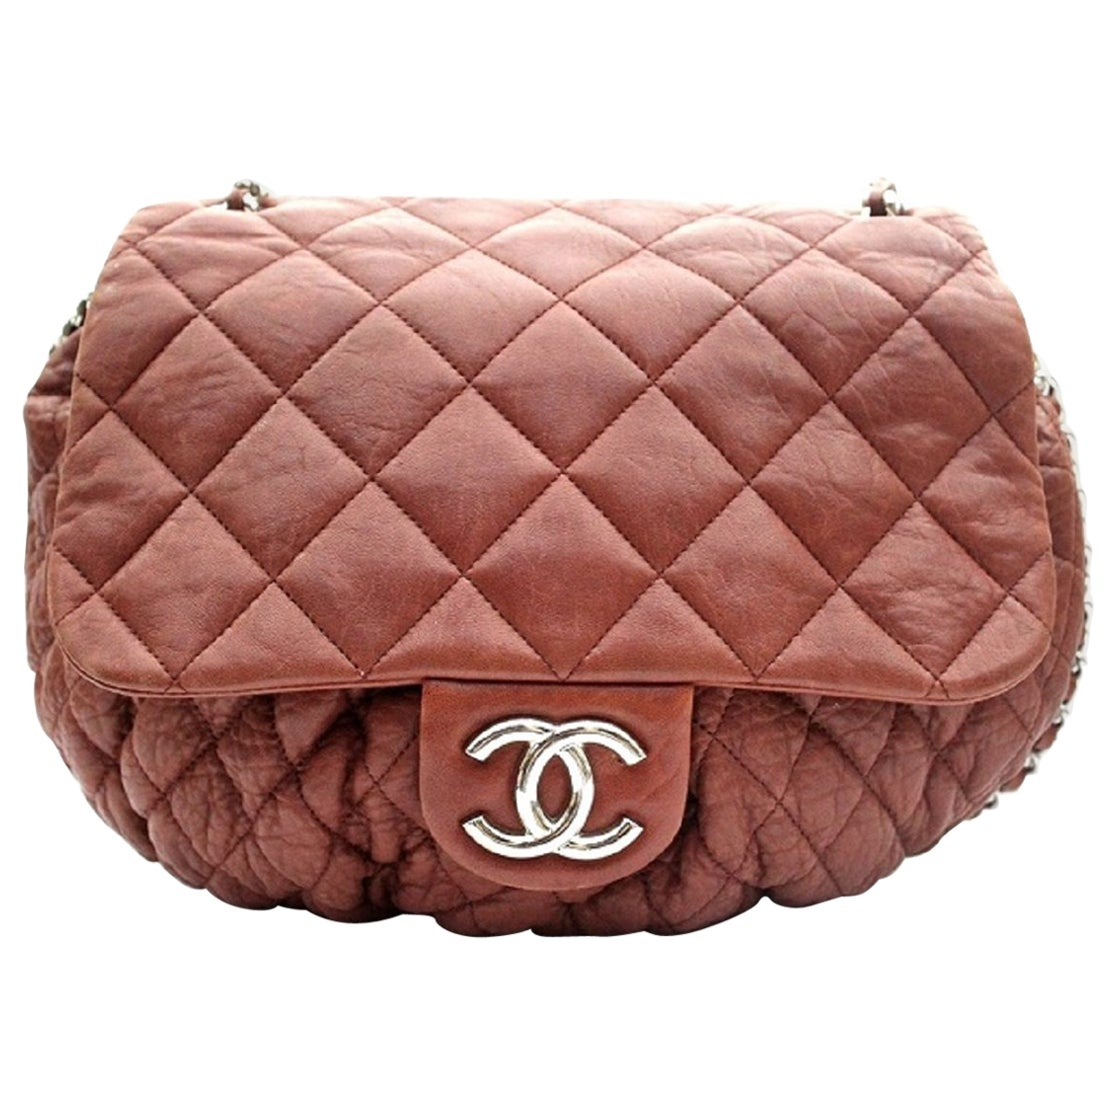 2011 Chanel Brown Brick Leather Chain Around Shoulder Bag